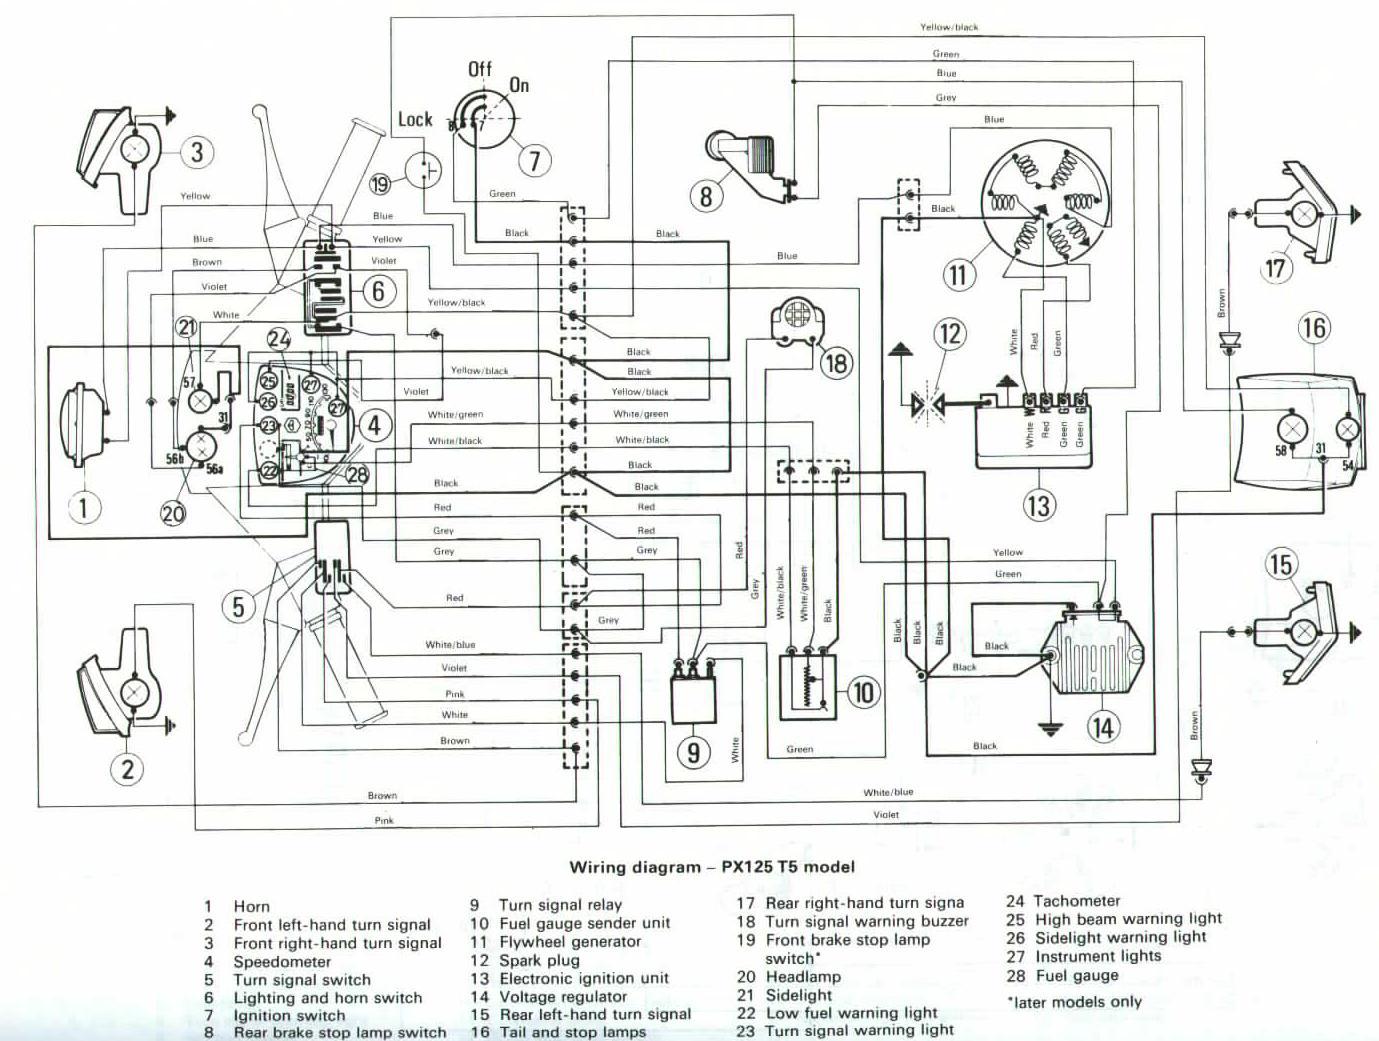 Schemi Elettrici Notifier : Schemi elettrici